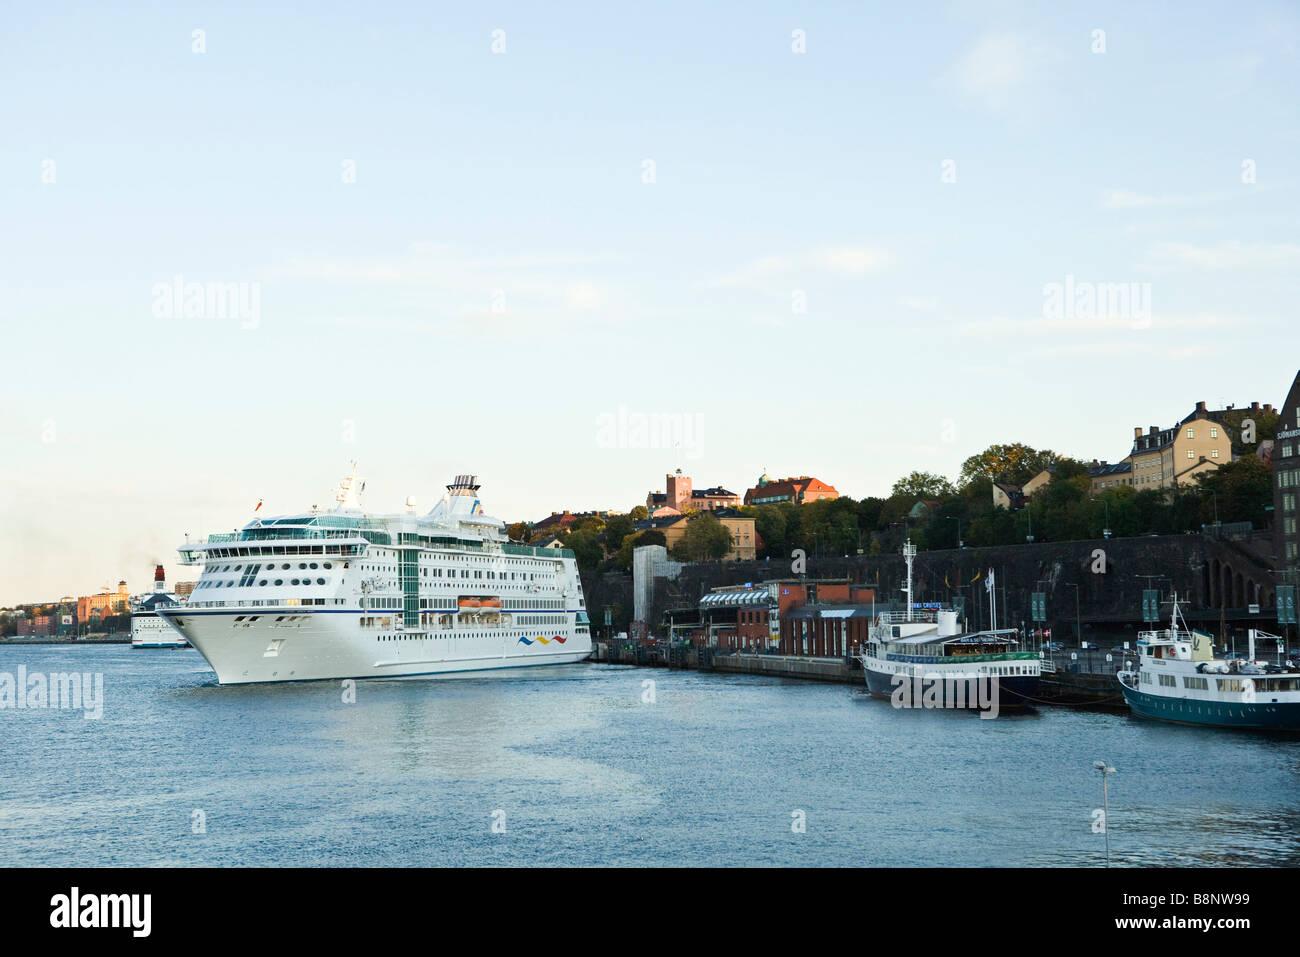 Sweden, Stockholm, Lake Malaren, ferry boat departing from dock - Stock Image